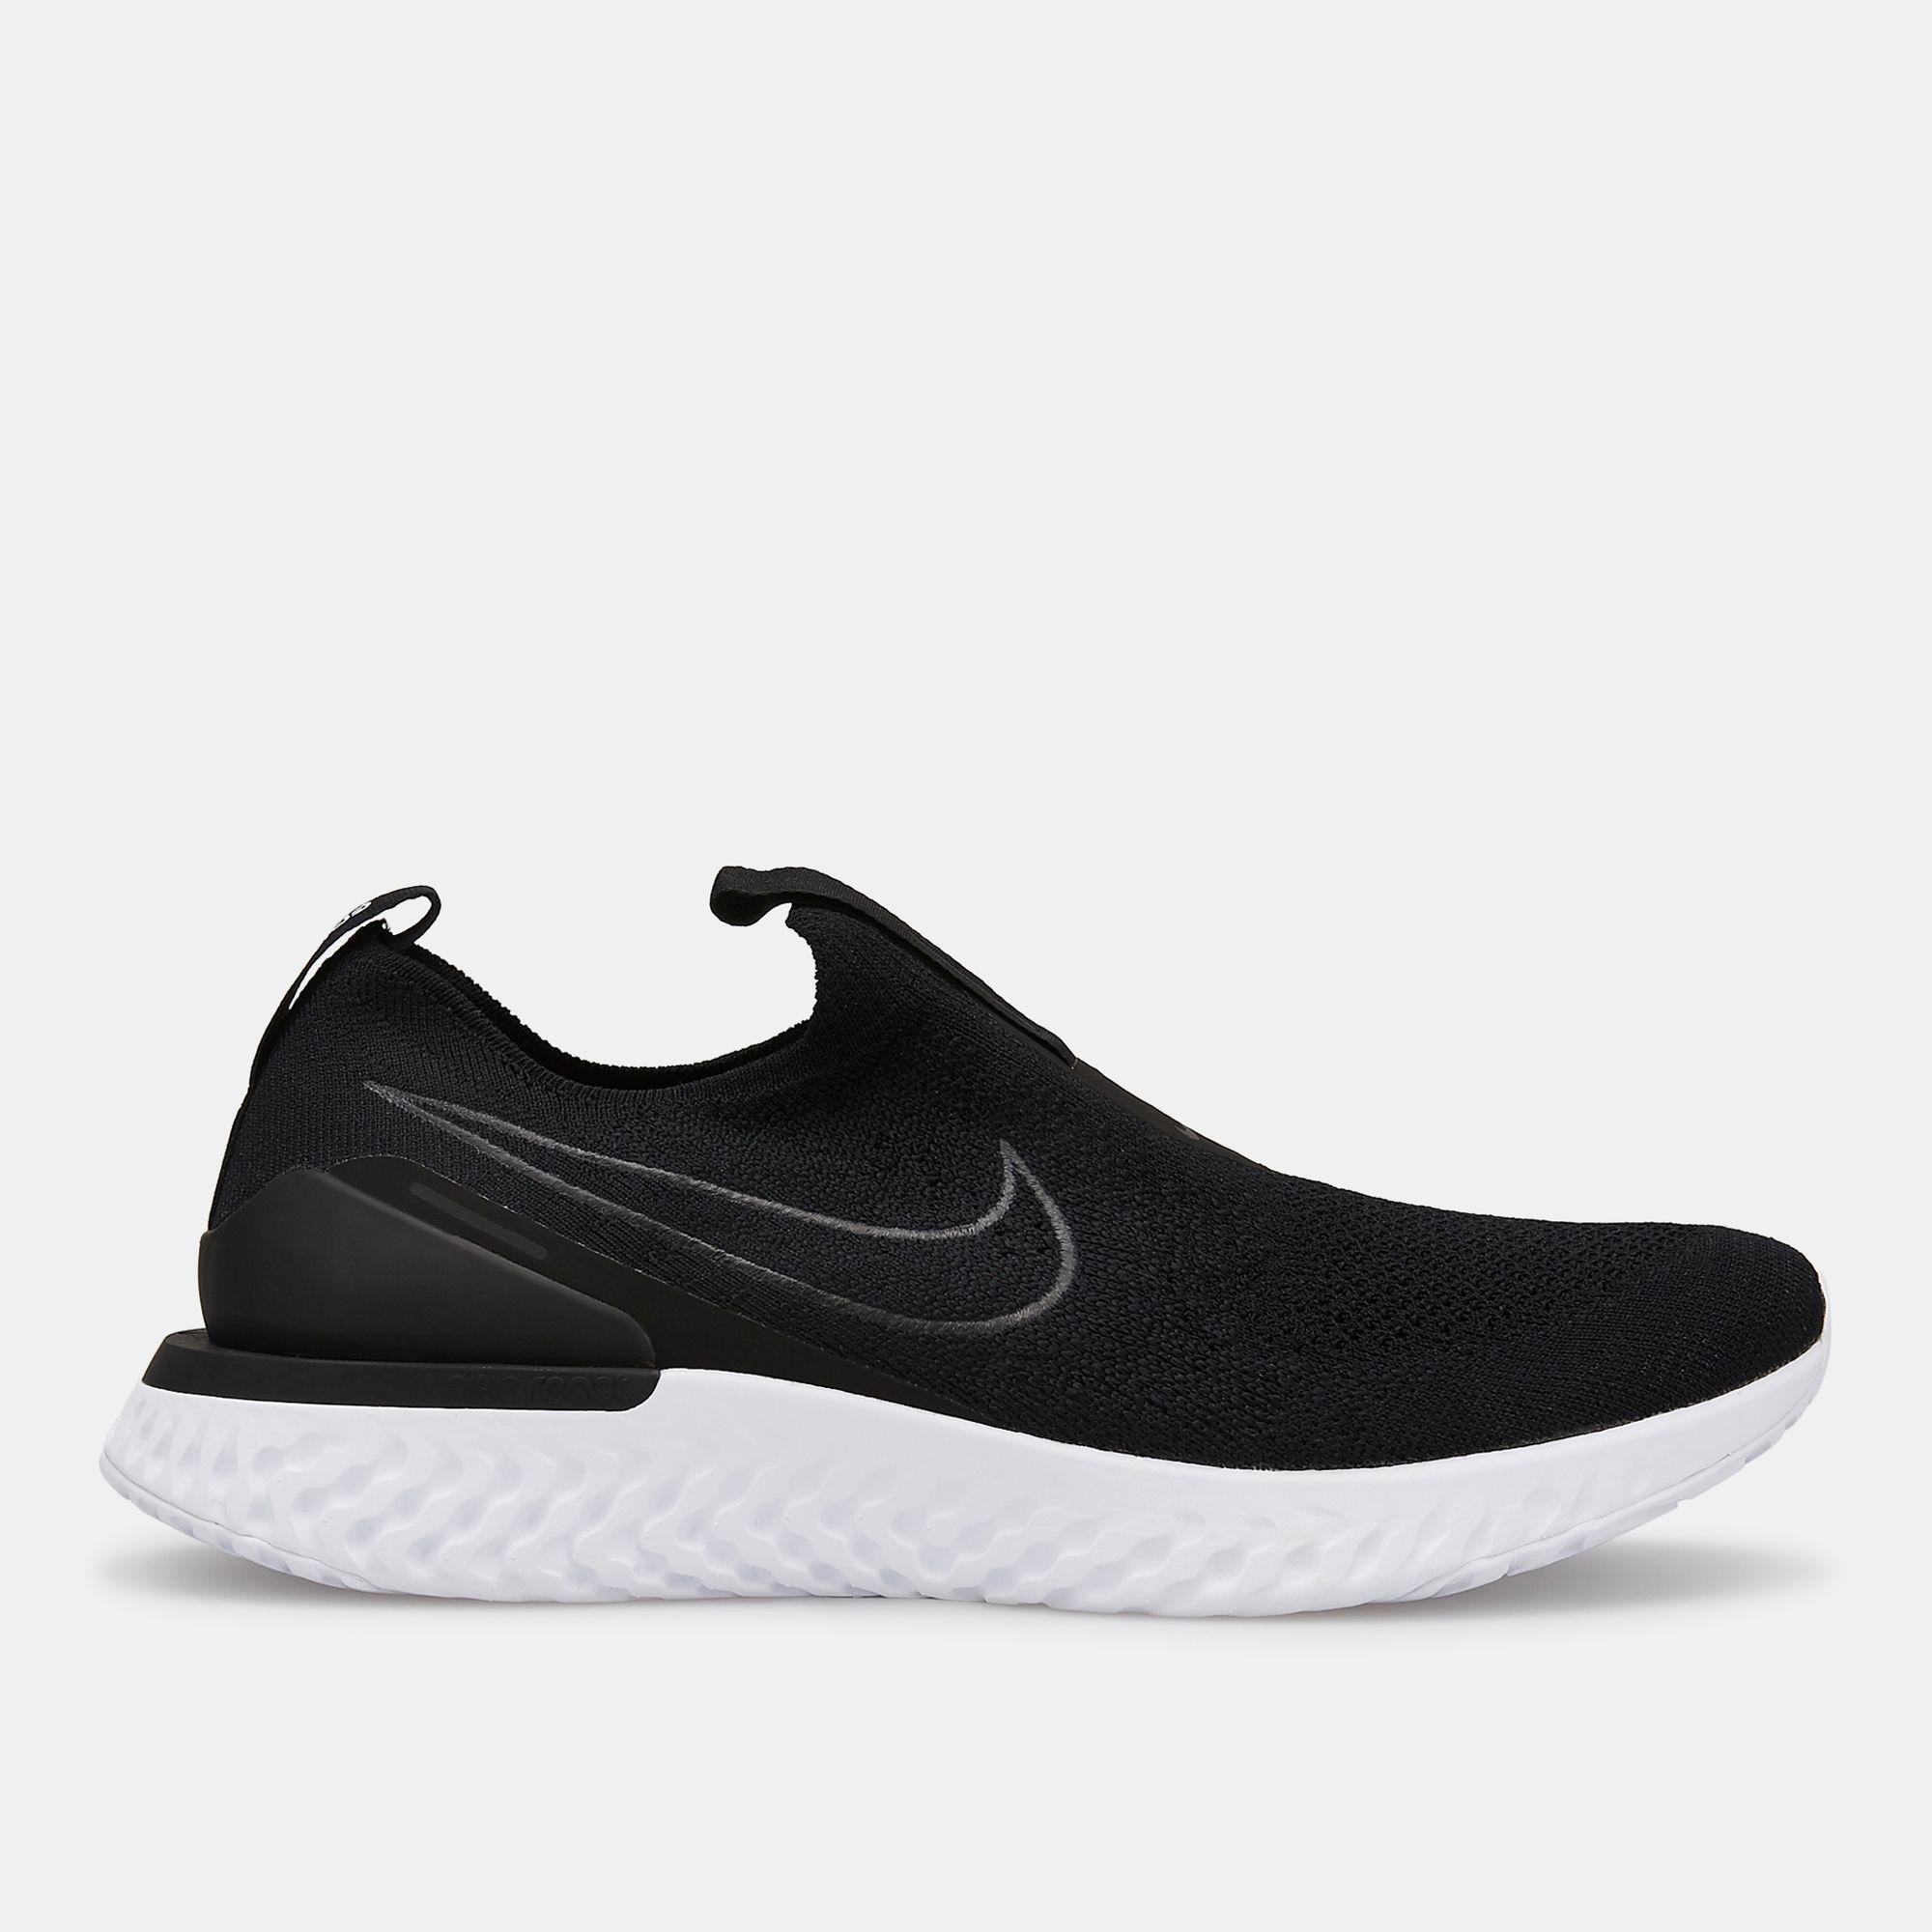 5ac7d7cd1f9af Nike Men s Epic Phantom React Flyknit Shoe